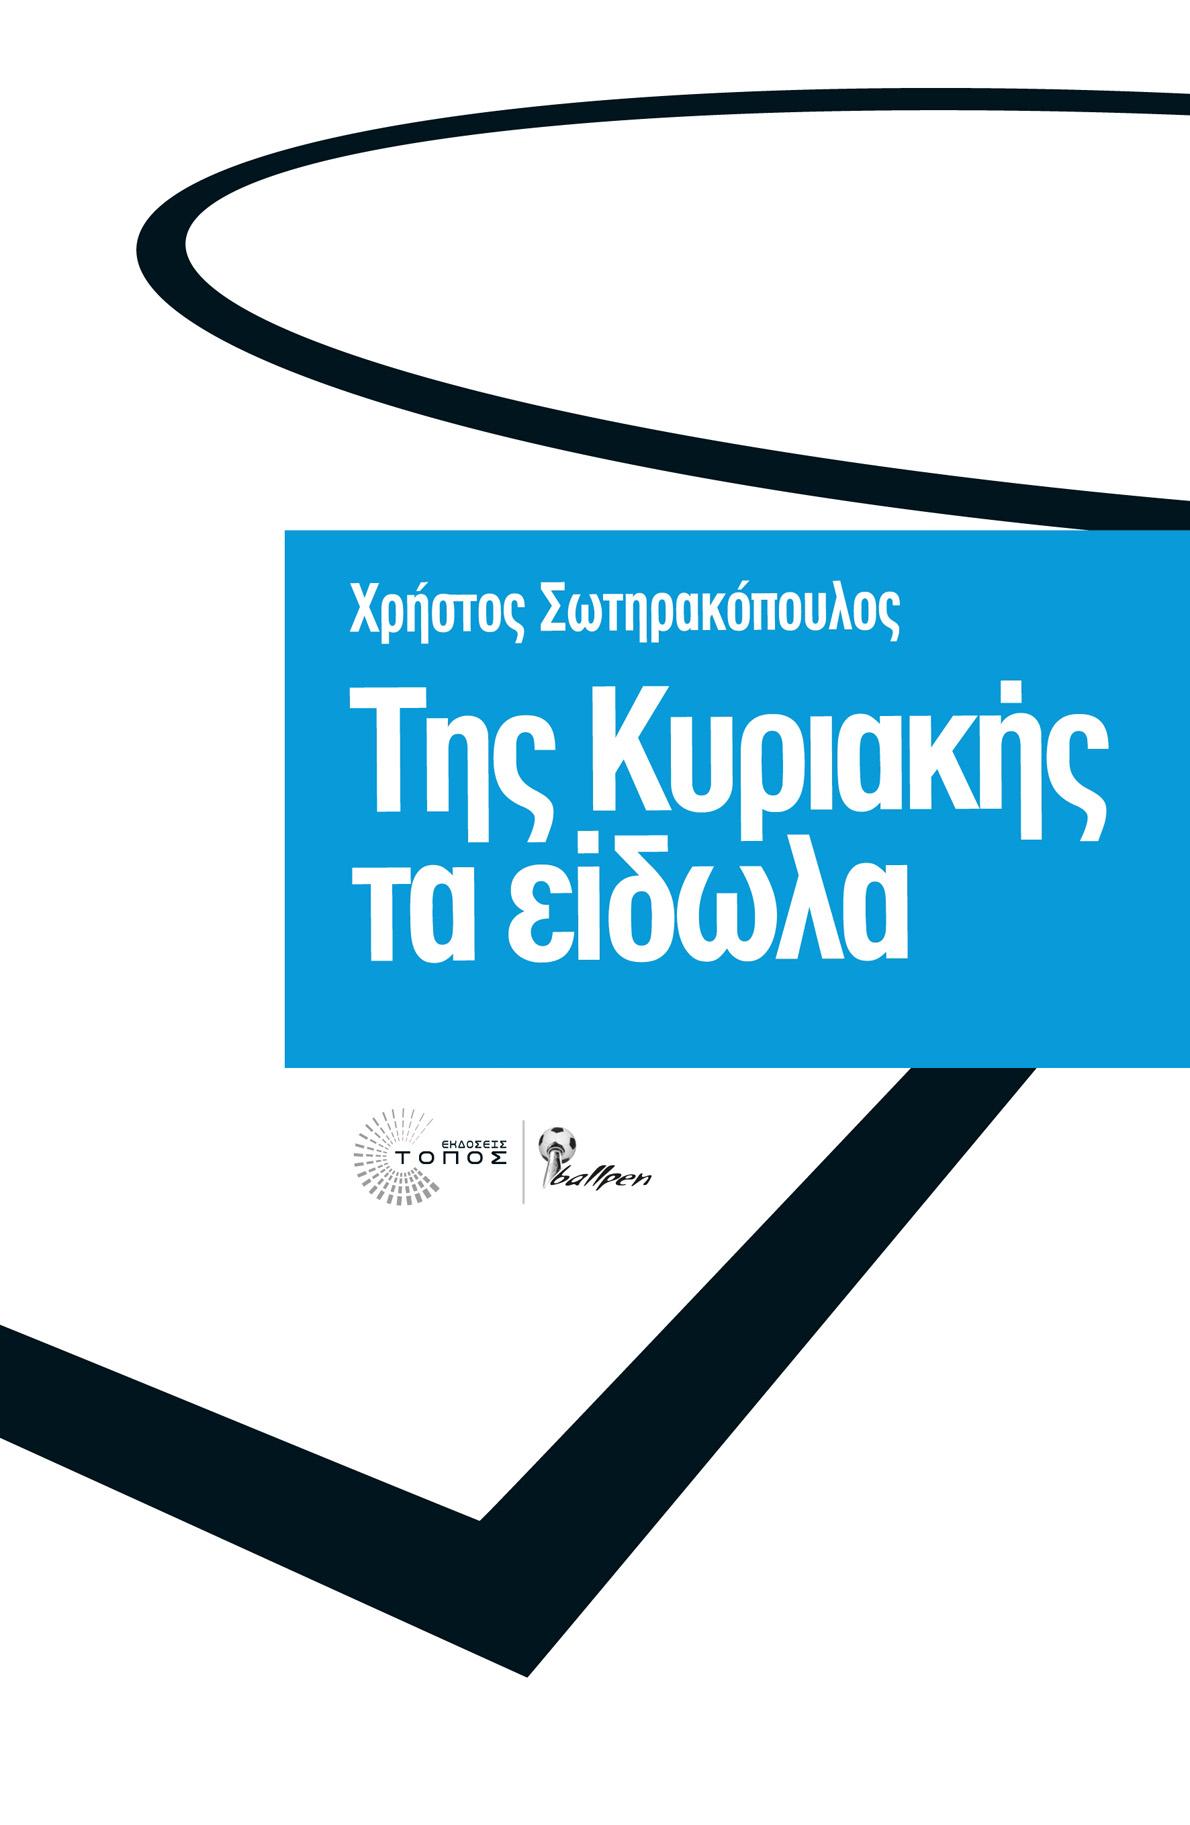 THS_KYRIAKHS_TA_EIDOLA